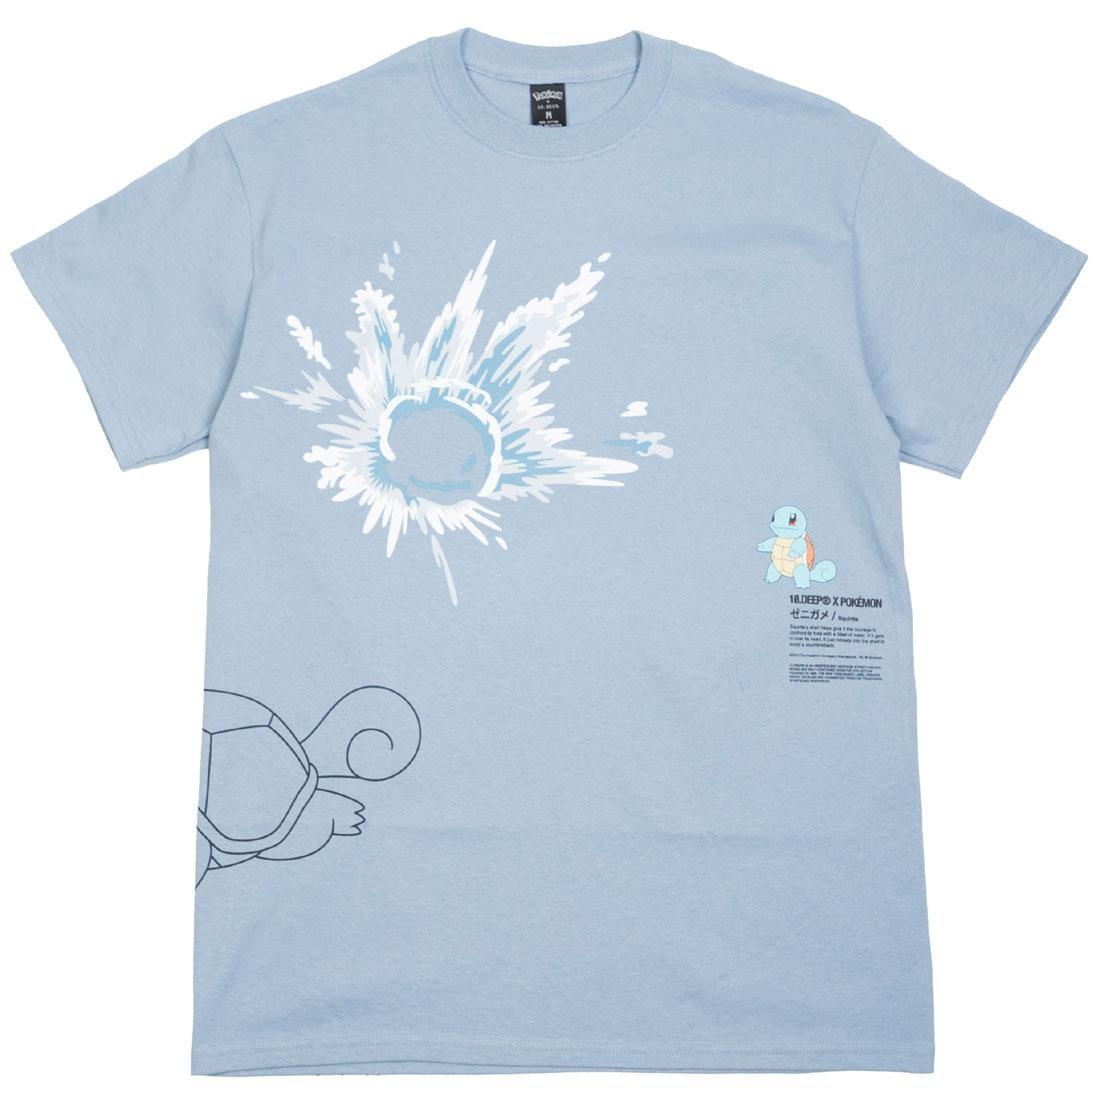 BAIT Exclusive 10 Deep x Pokemon Men Waterblast Tee (blue / light blue)